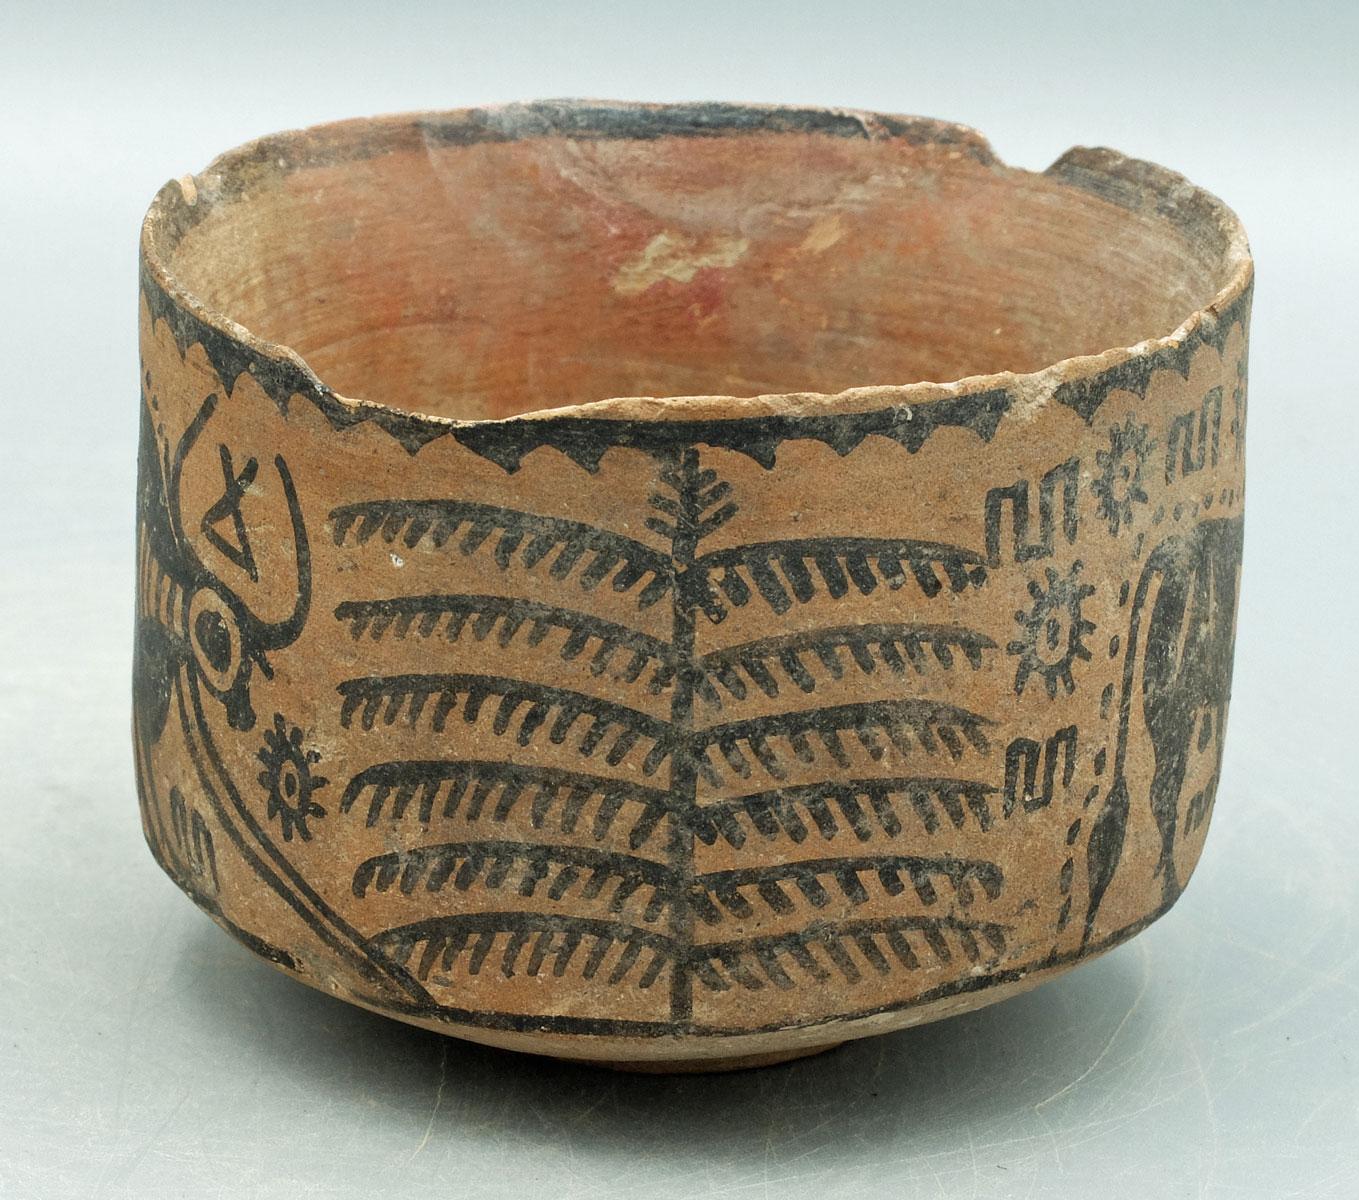 Harappan Jar - Indus Valley, ca. 2500 - 1800 BC - Image 2 of 3